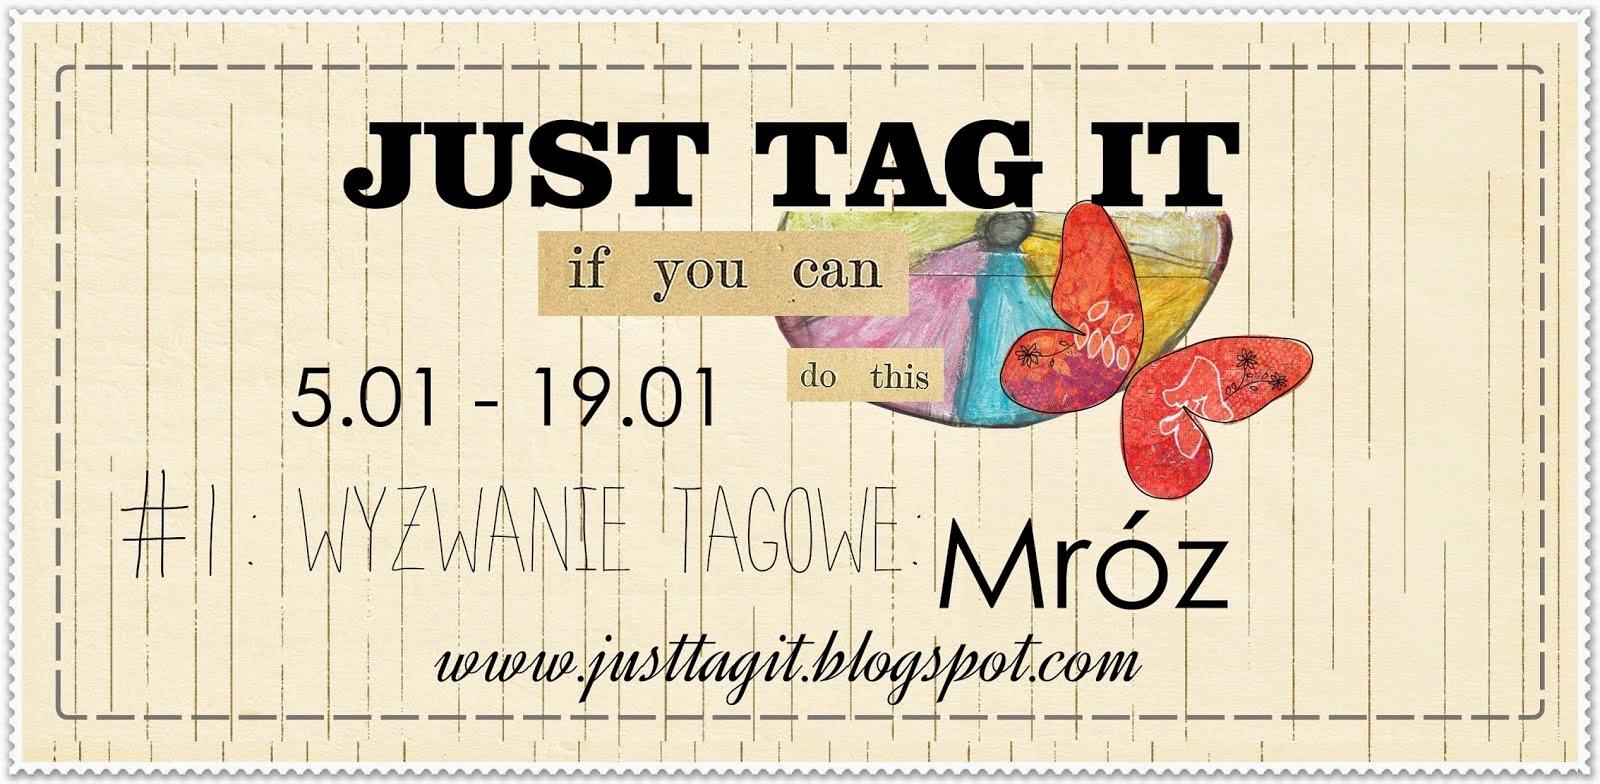 http://justtagit.blogspot.com/2015/01/1-wyzwanie-tagowe-mroz.html